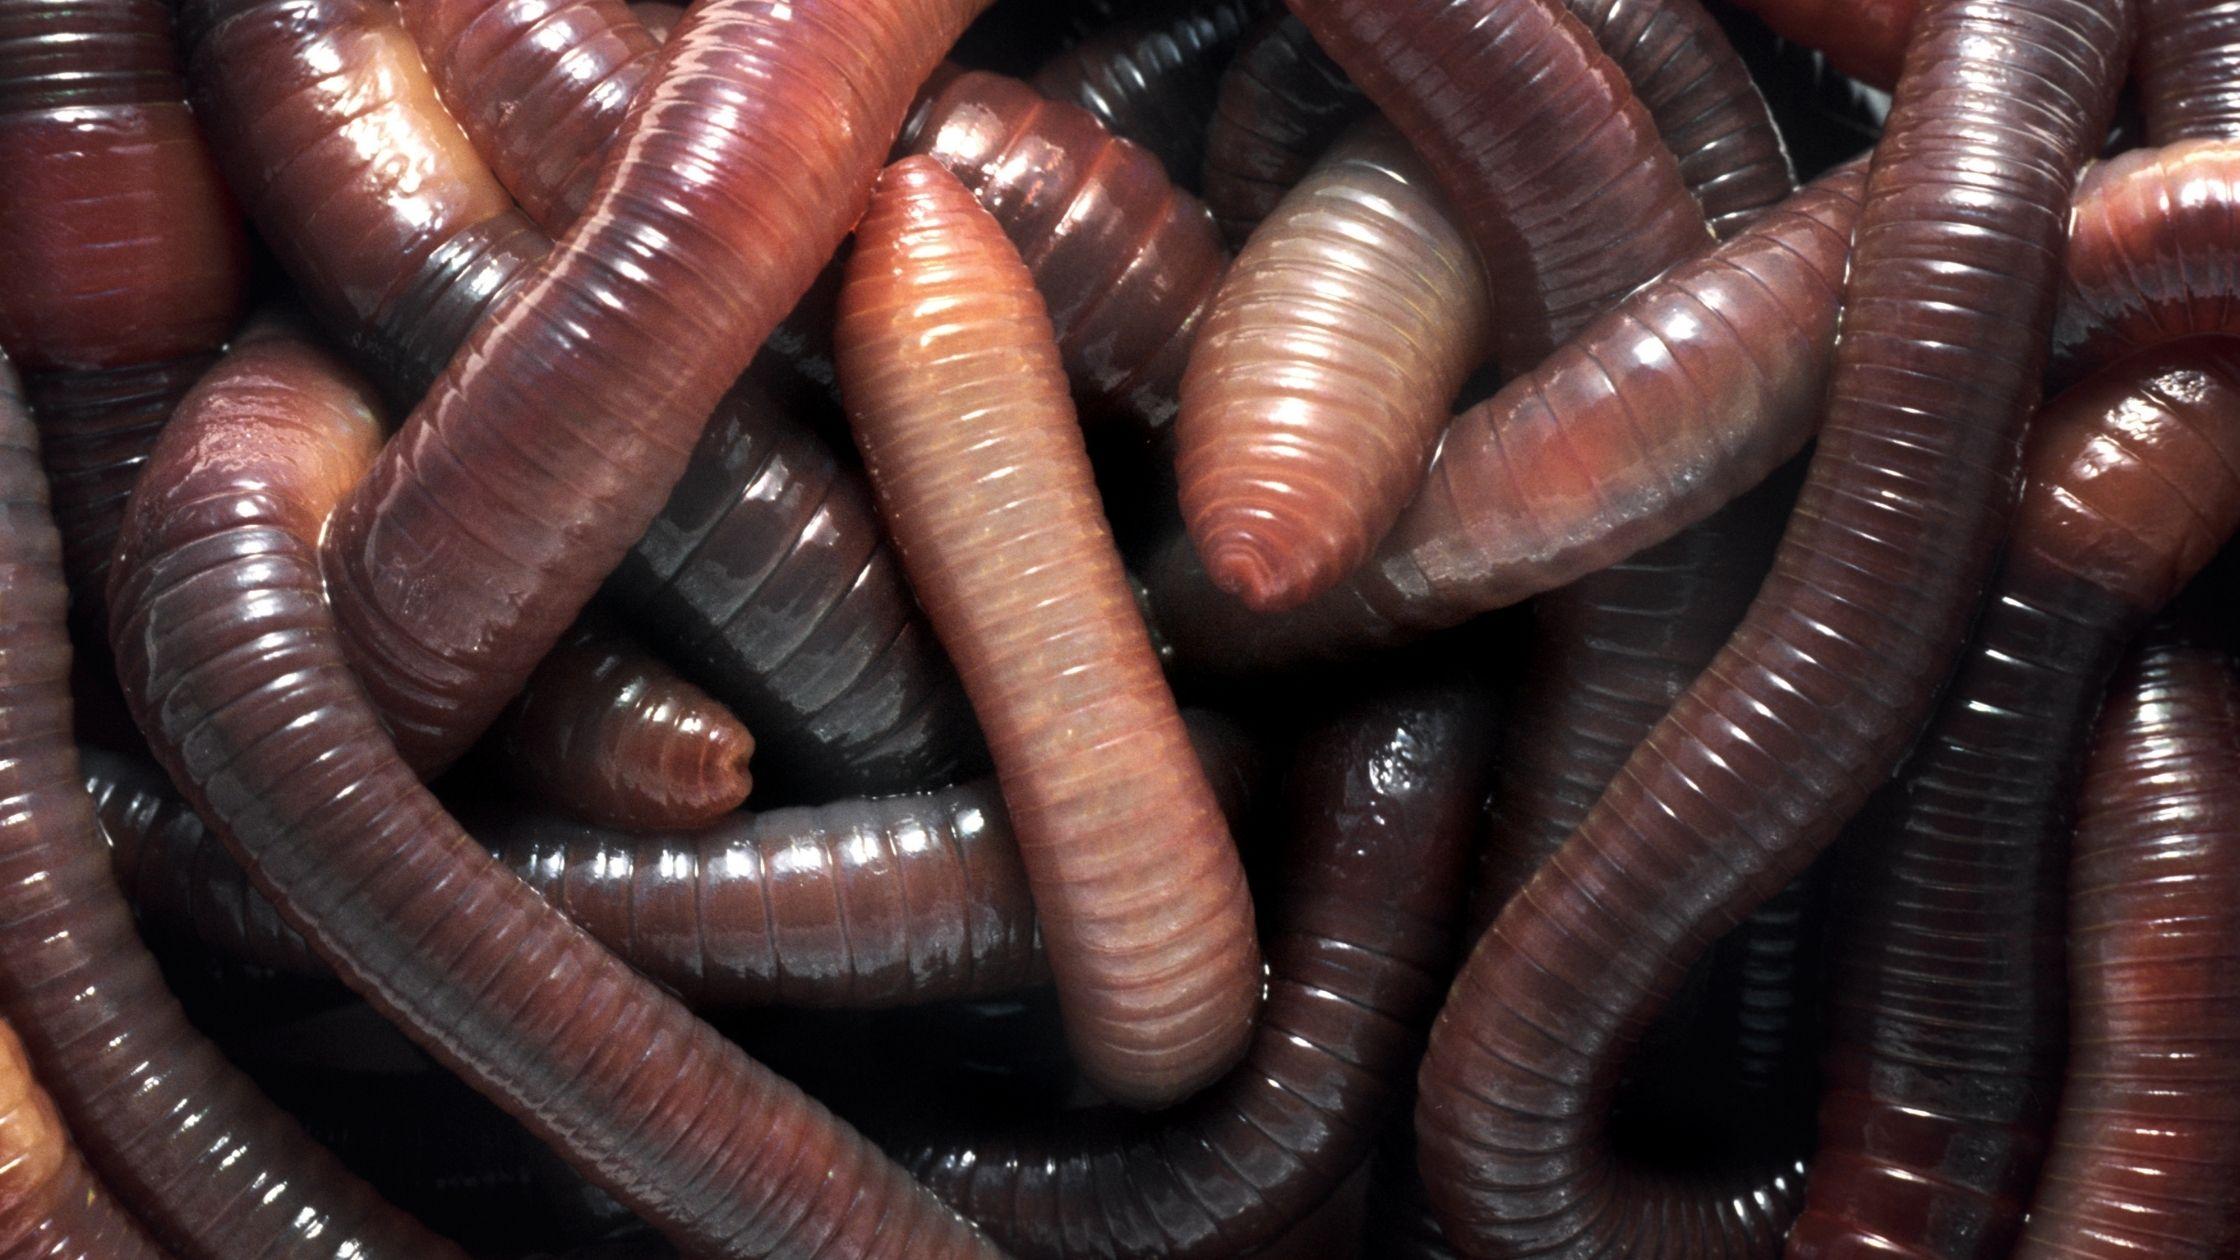 Types of Fishing Worms: Nightcrawler Fishing Worms